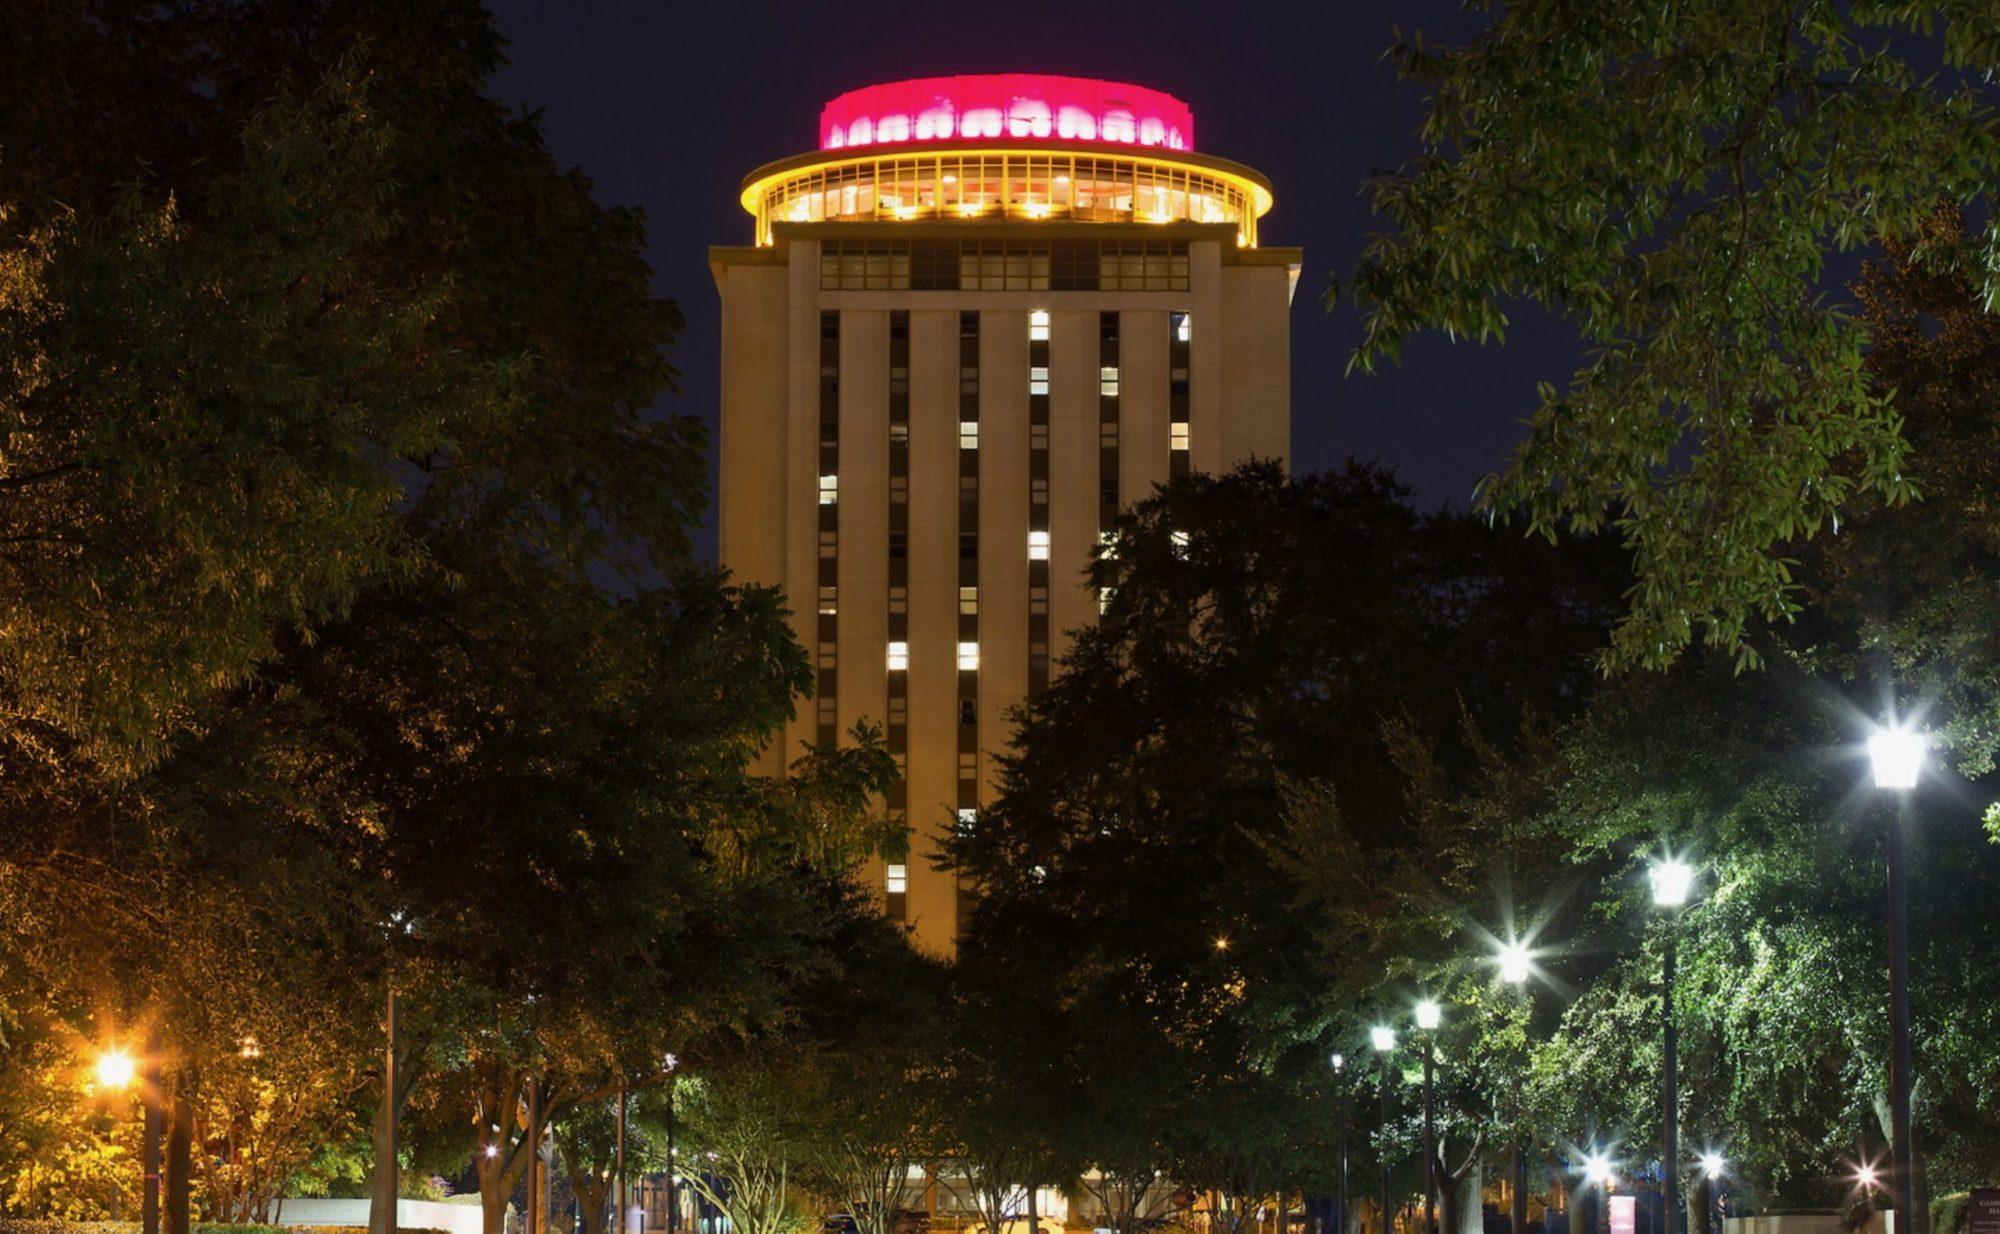 FITSNews – University Of South Carolina Trustee Drama: We Called It